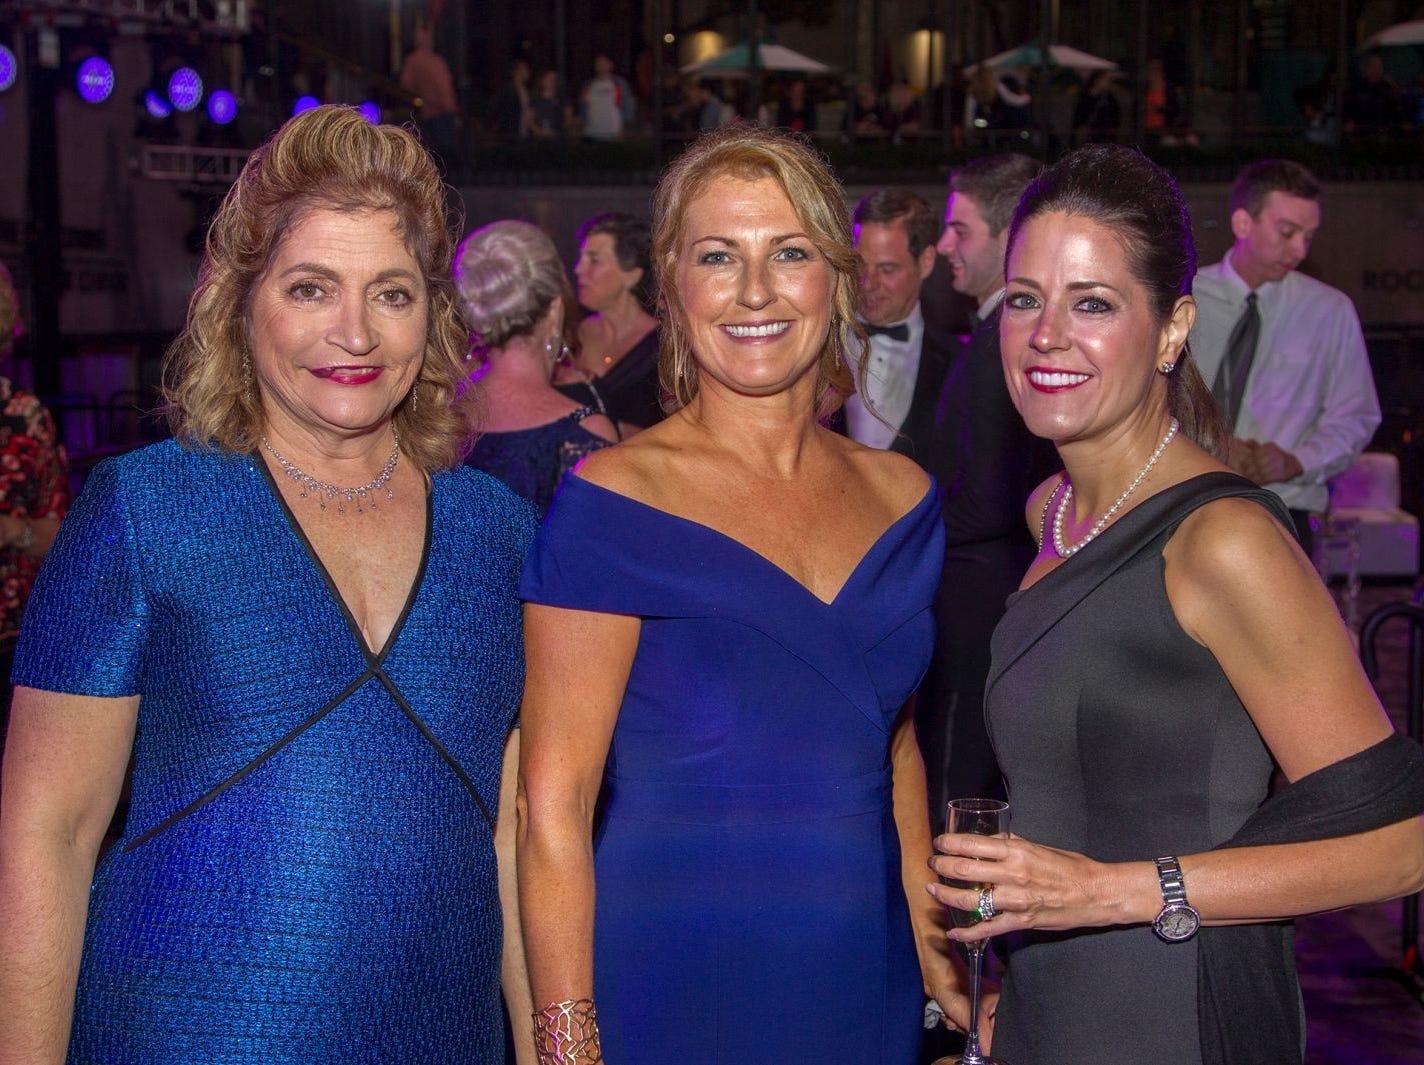 Laura Garrett, Colleen Sparta, Patrice Cahill. Hackensack University Medical Center Foundation held its 25th anniversary Recognition Gala at Rockefeller Center, NY. 10/06/2018